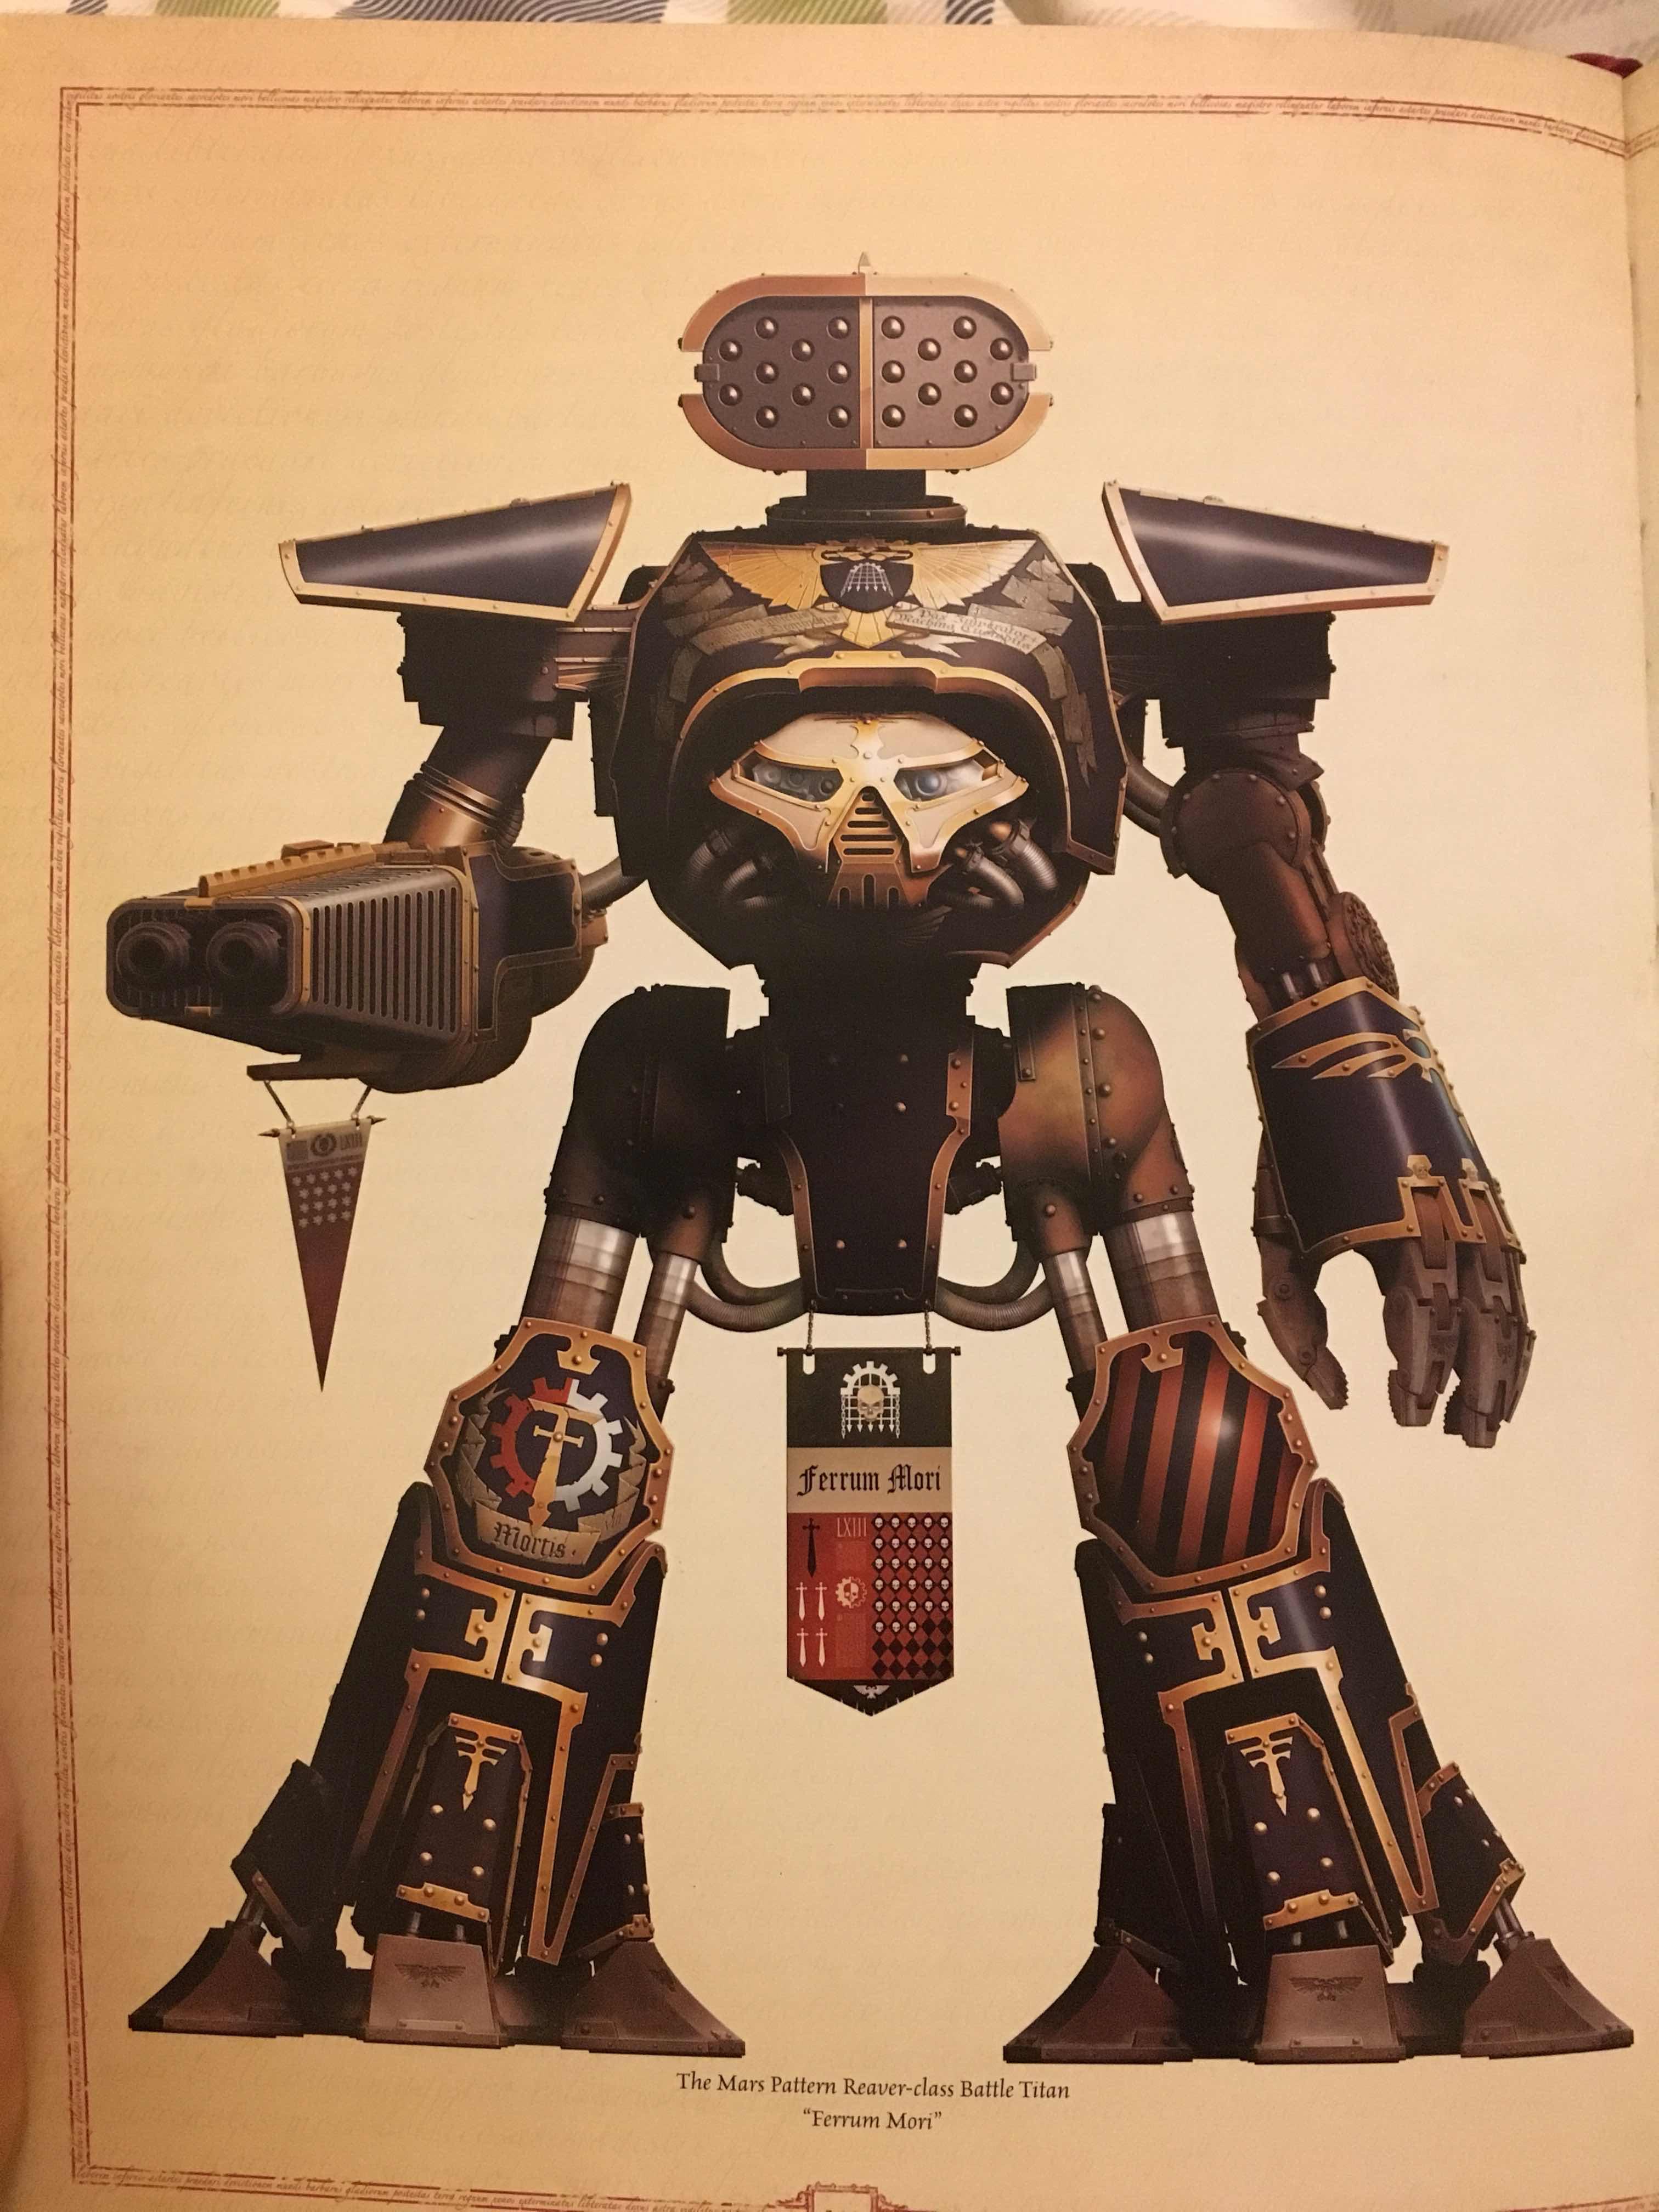 Battle Bunnies: Adeptus Titanicus - Maniple and Engine names